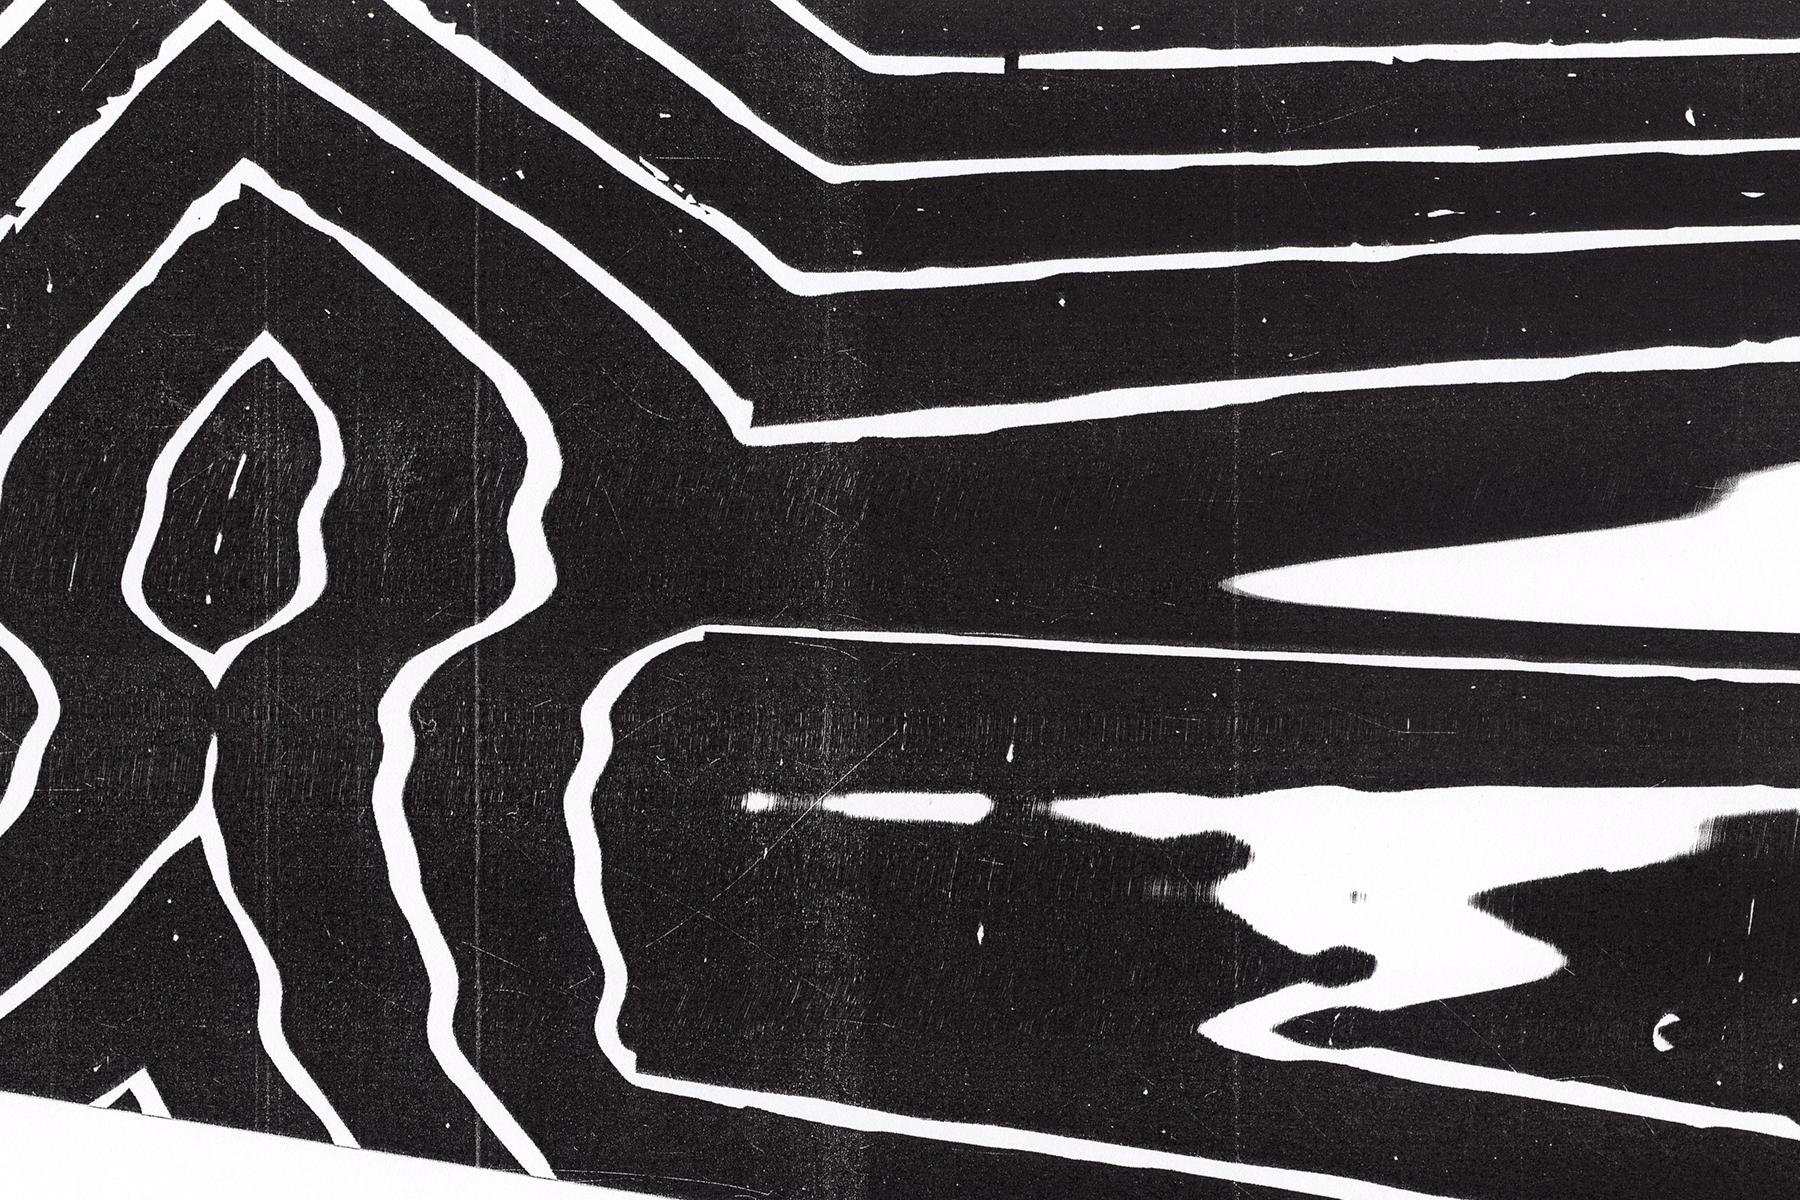 16 Photocopied Stripes example image 2